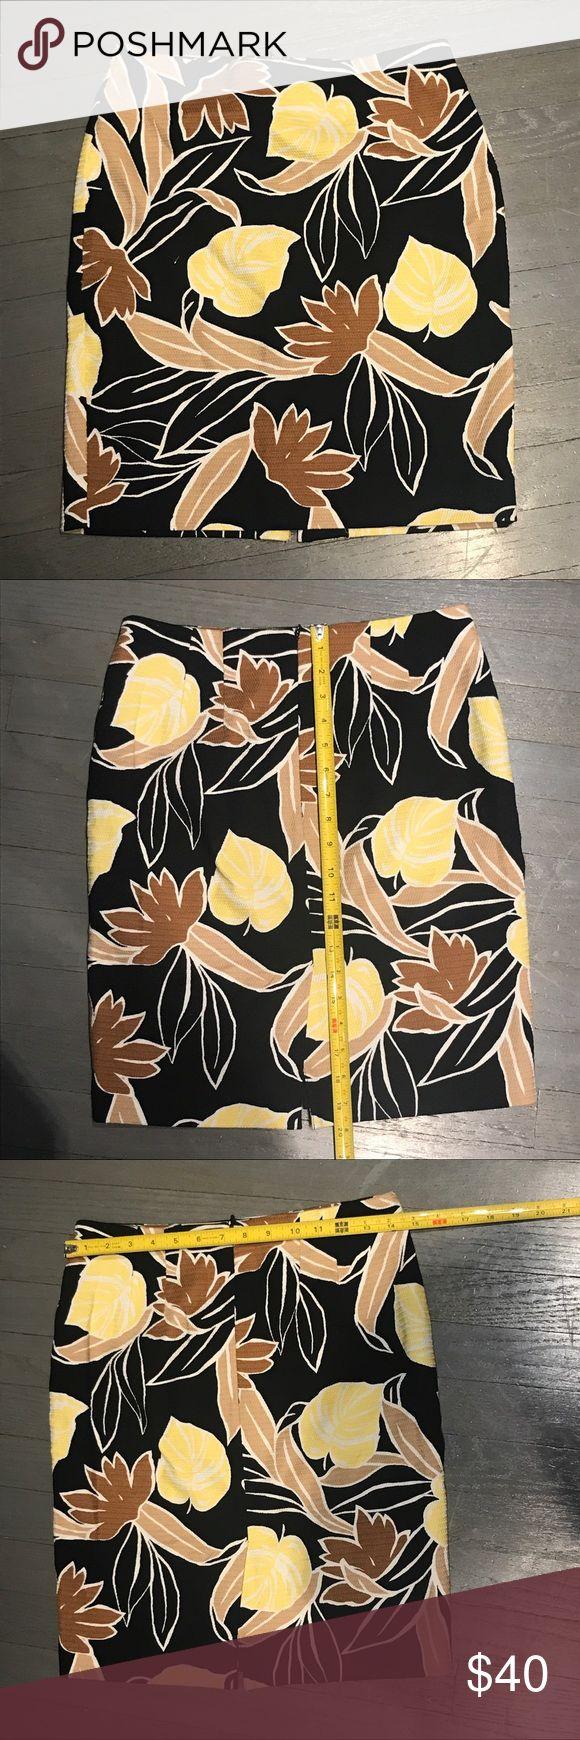 Ann Taylor Black Cotton Brown Leaf Pencil Skirt Ann Taylor Factory Black Cotton Brown and Yellow Leaf Floral Pencil Skirt Ann Taylor Skirts Pencil